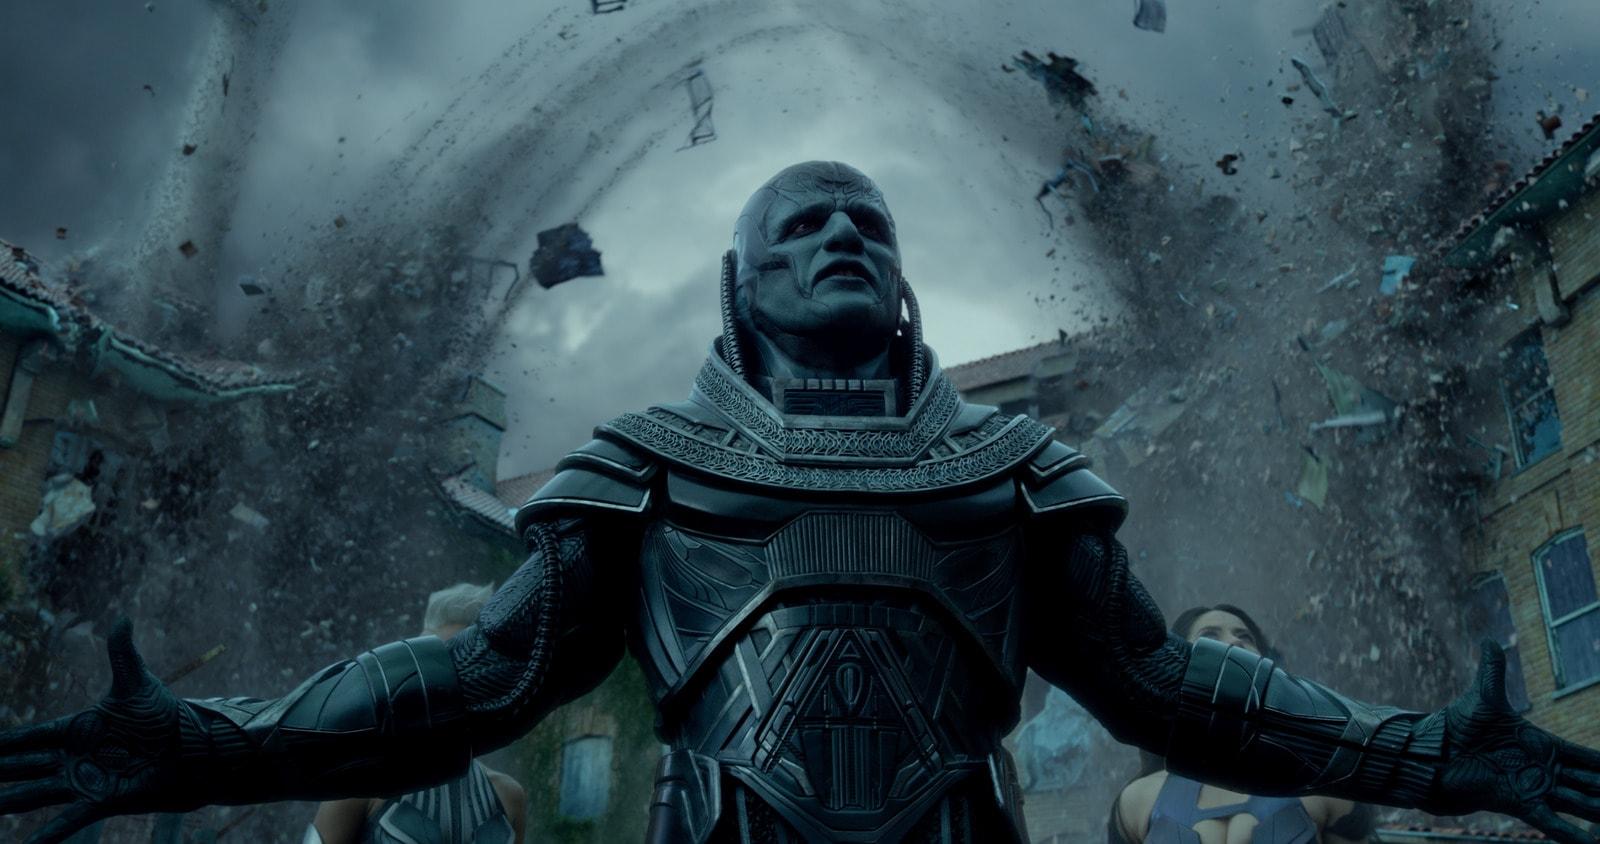 Oscar Isaac in X-Men: Apocalypse (2016)